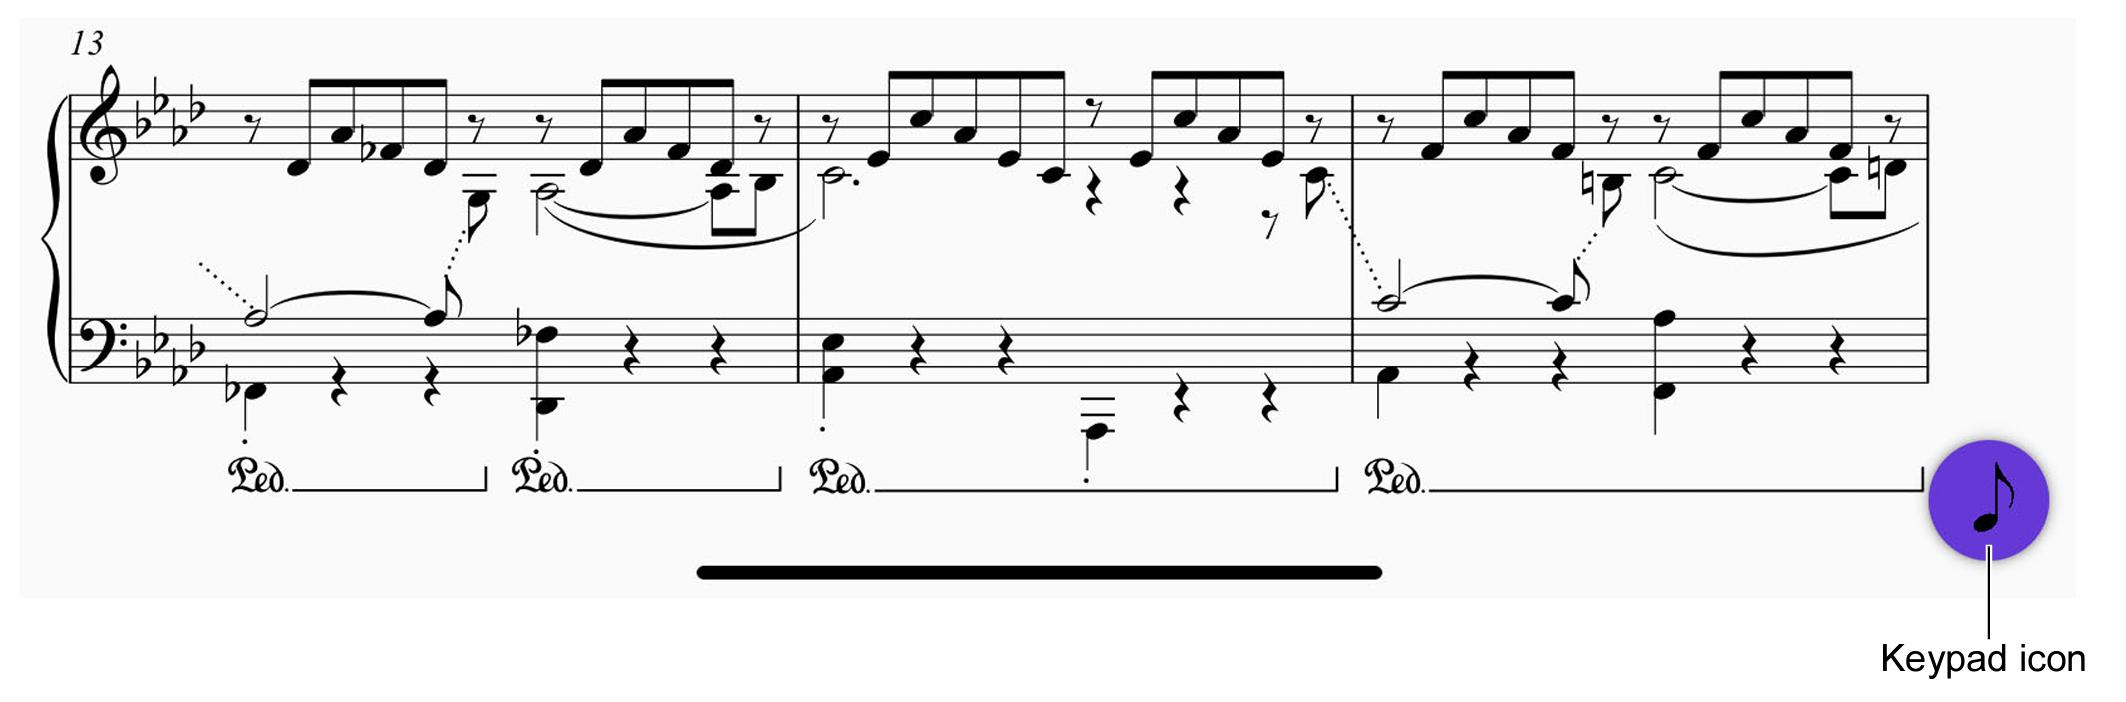 Zappa blog 8